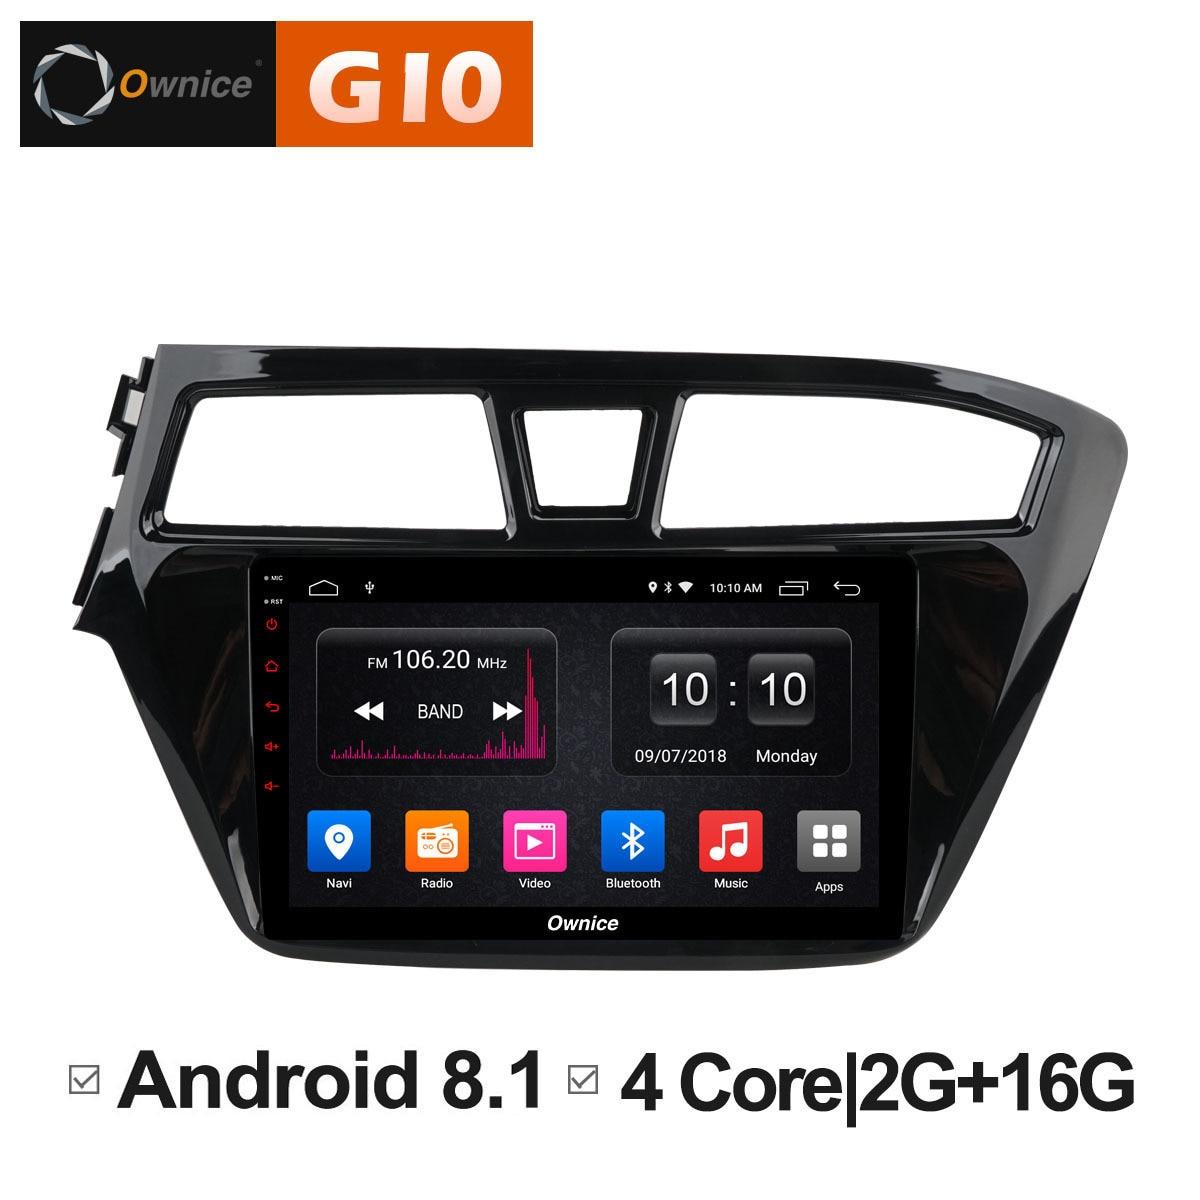 Android 8,1 блок для HYUNDAI I20 2015 2016 2017 2018 автомобилей Smart площадку компьютер DVD мультимедийный плеер gps радио CD аудио навигации